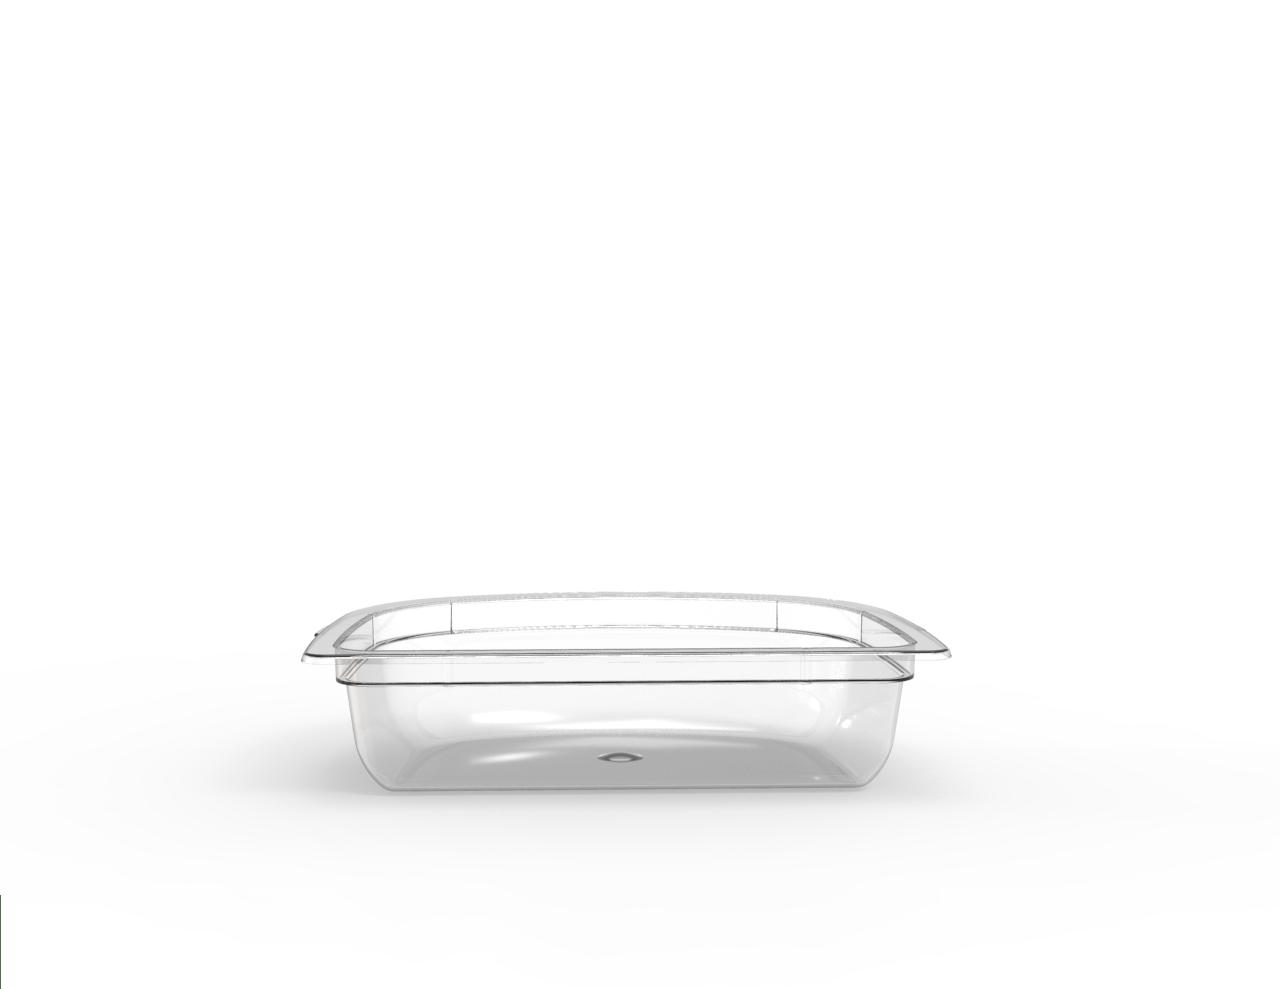 Barquette demi-lune operculable transparente 230 cm3